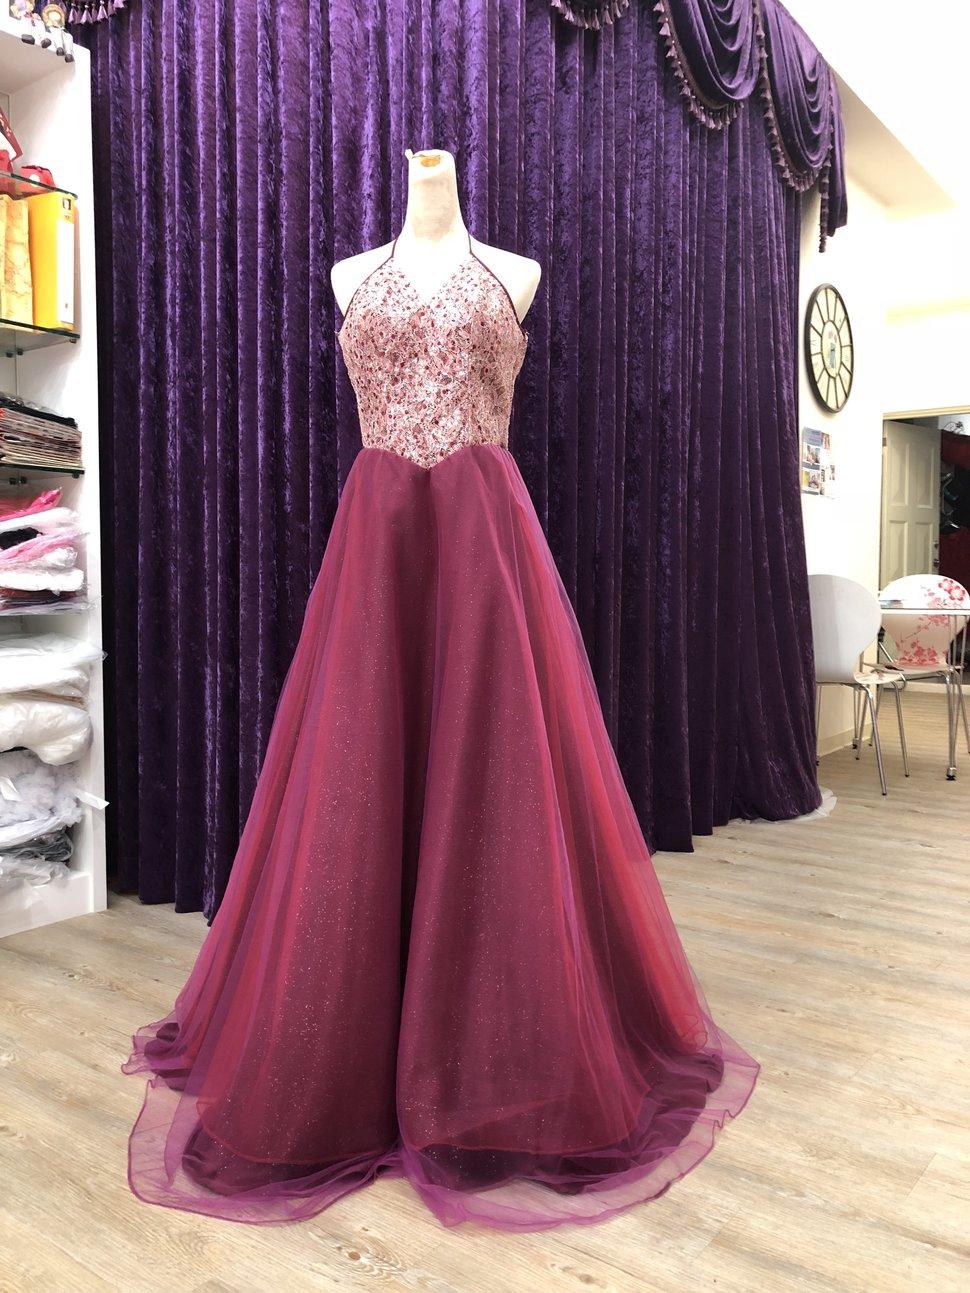 IMG_5234 - 全台最便宜-45DESIGN四五婚紗禮服《結婚吧》